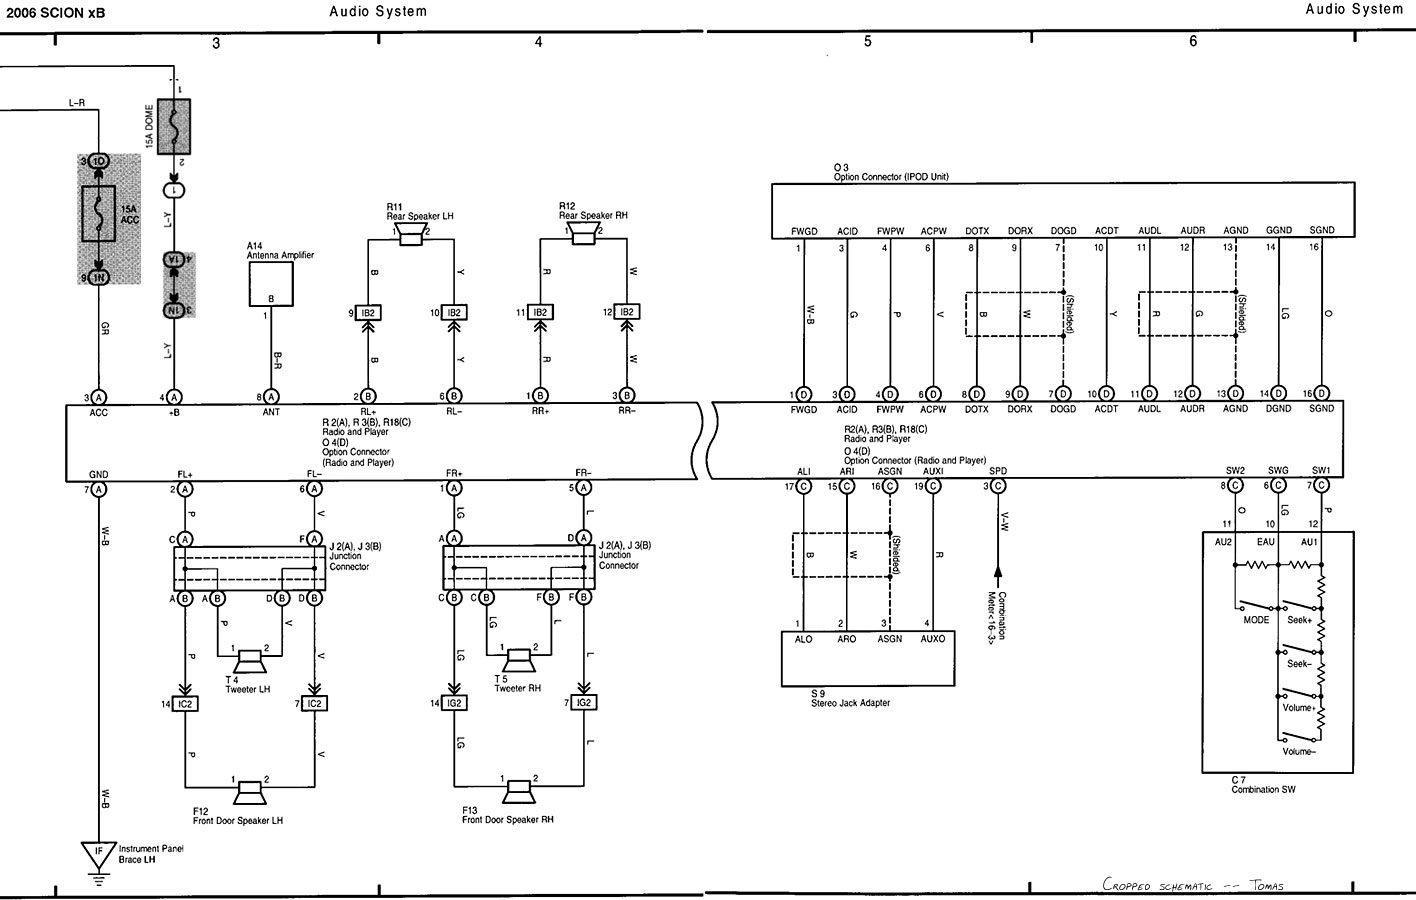 2005 scion tc radio wiring diagram?t\\\\\\\\\\\\\\\\\\\\\\\\\\\\\\\\\\\\\\\\\\\\\\\\\\\\\\\\\\\\\\\=1508751668 2005 scion tc wiring harness wiring diagrams schematics